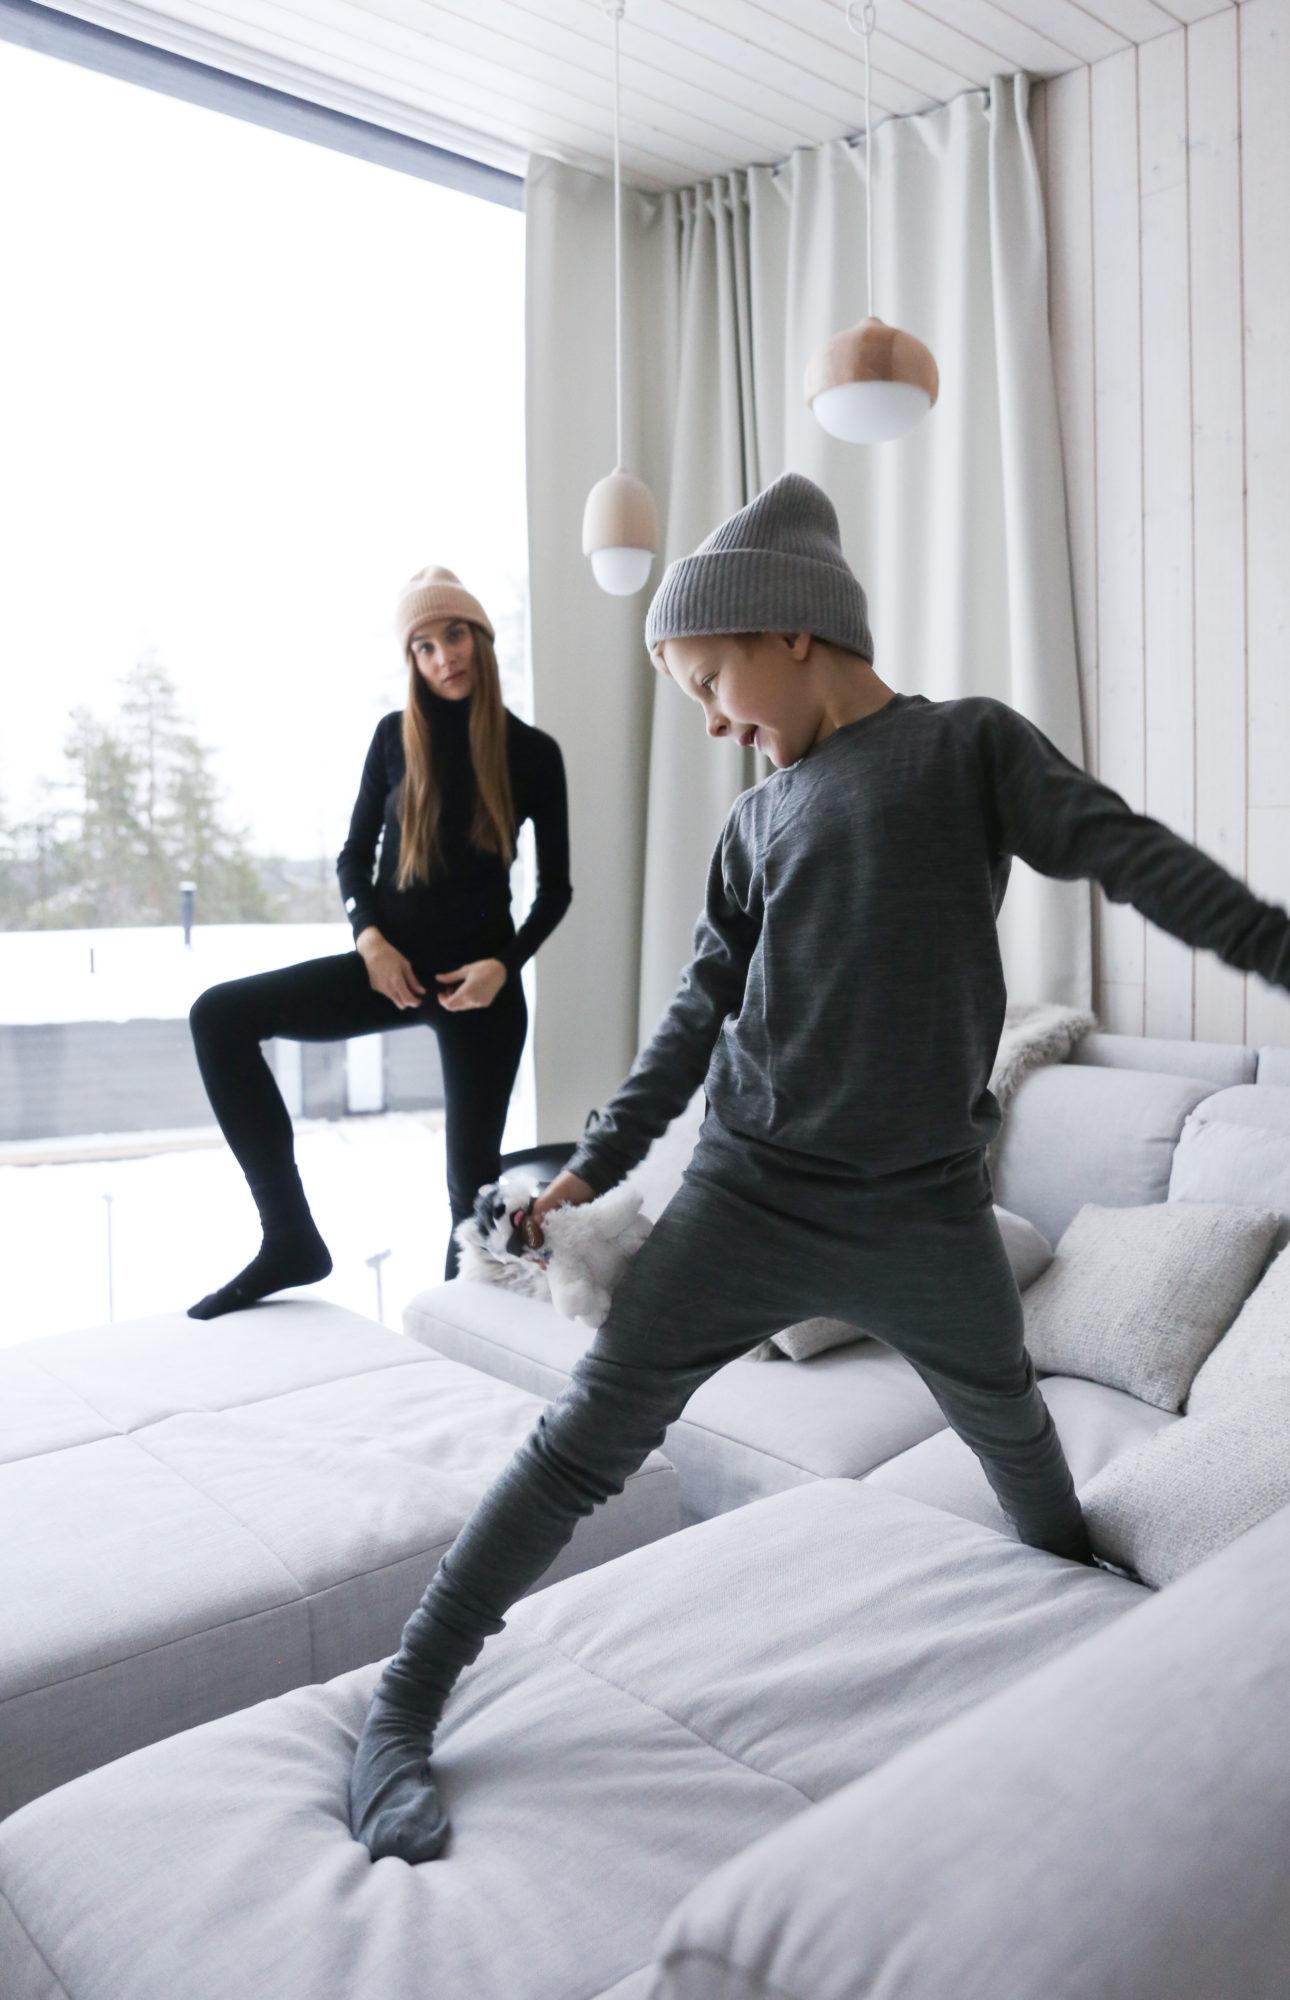 Didem ja Luca seisoo sohvalla.